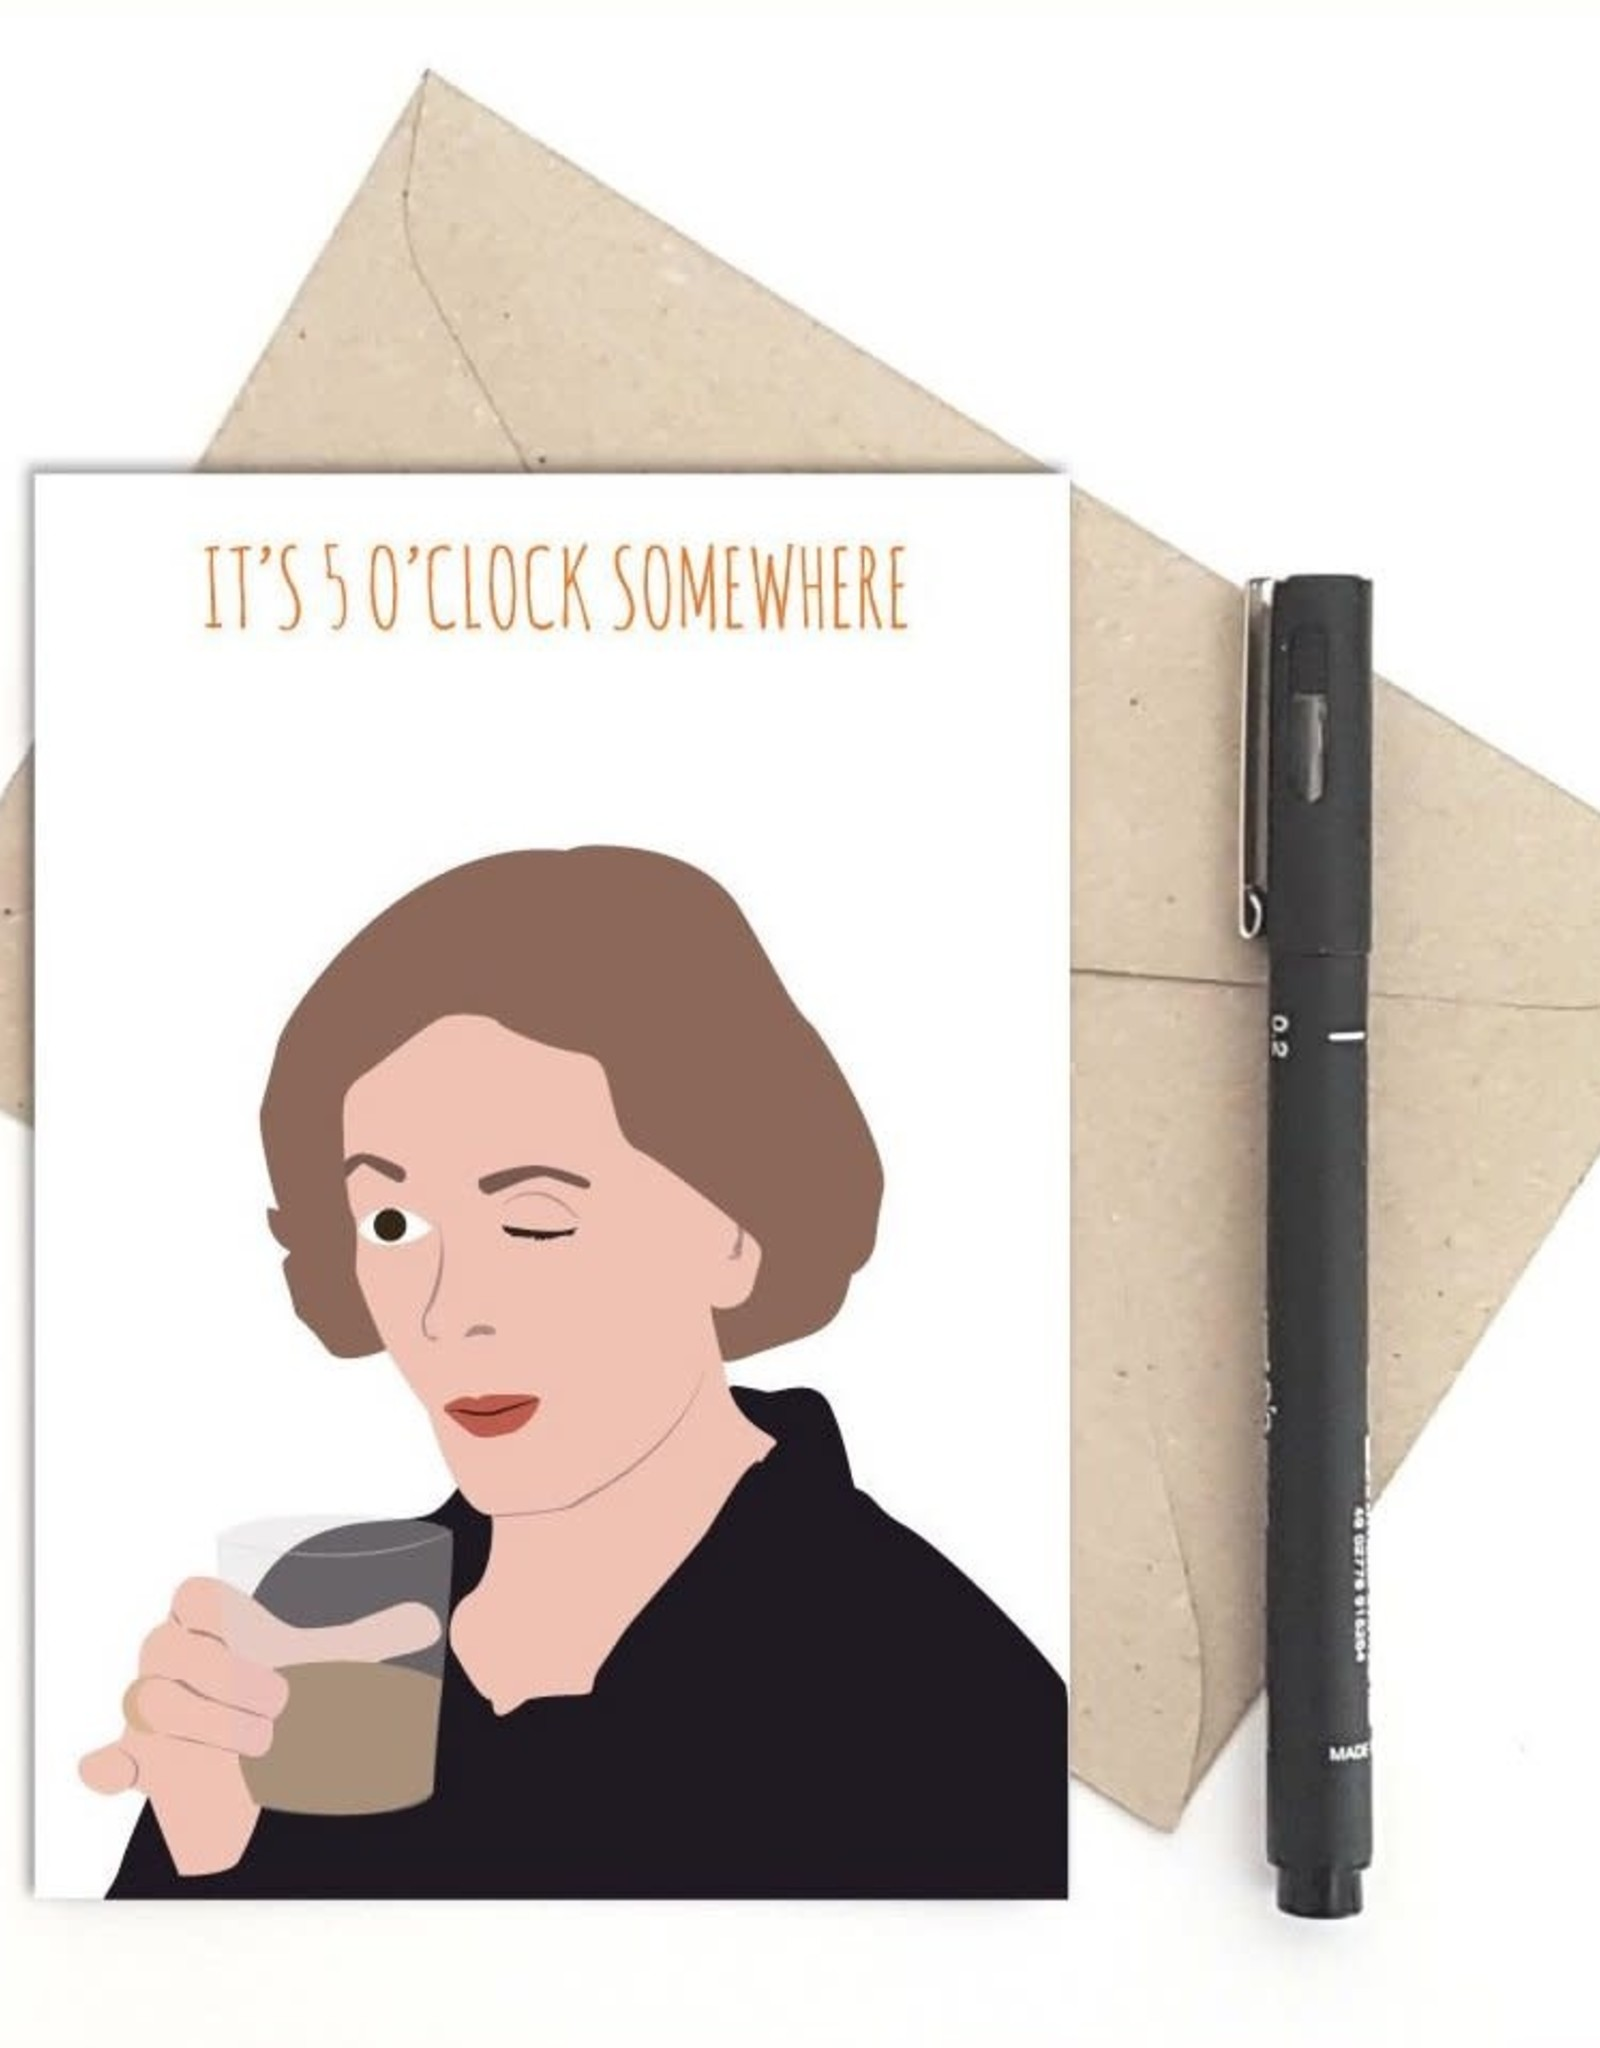 Meet Me in Shermer 5 O'Clock Somewhere (Arrested Development) Greeting Card